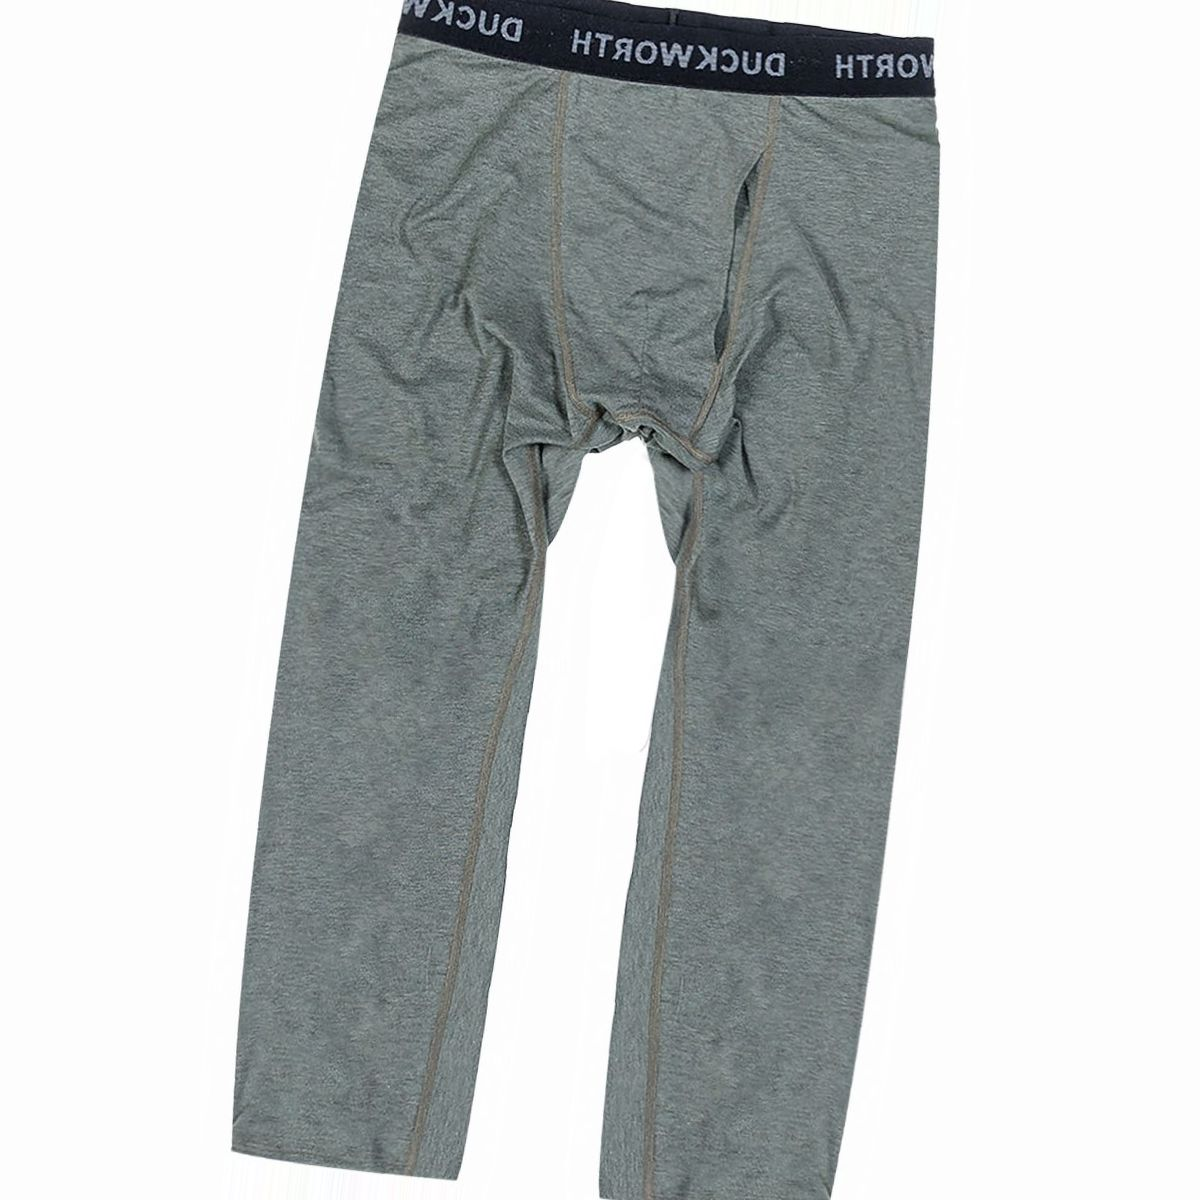 Duckworth Vapor Wool 3/4 Legging - Men's